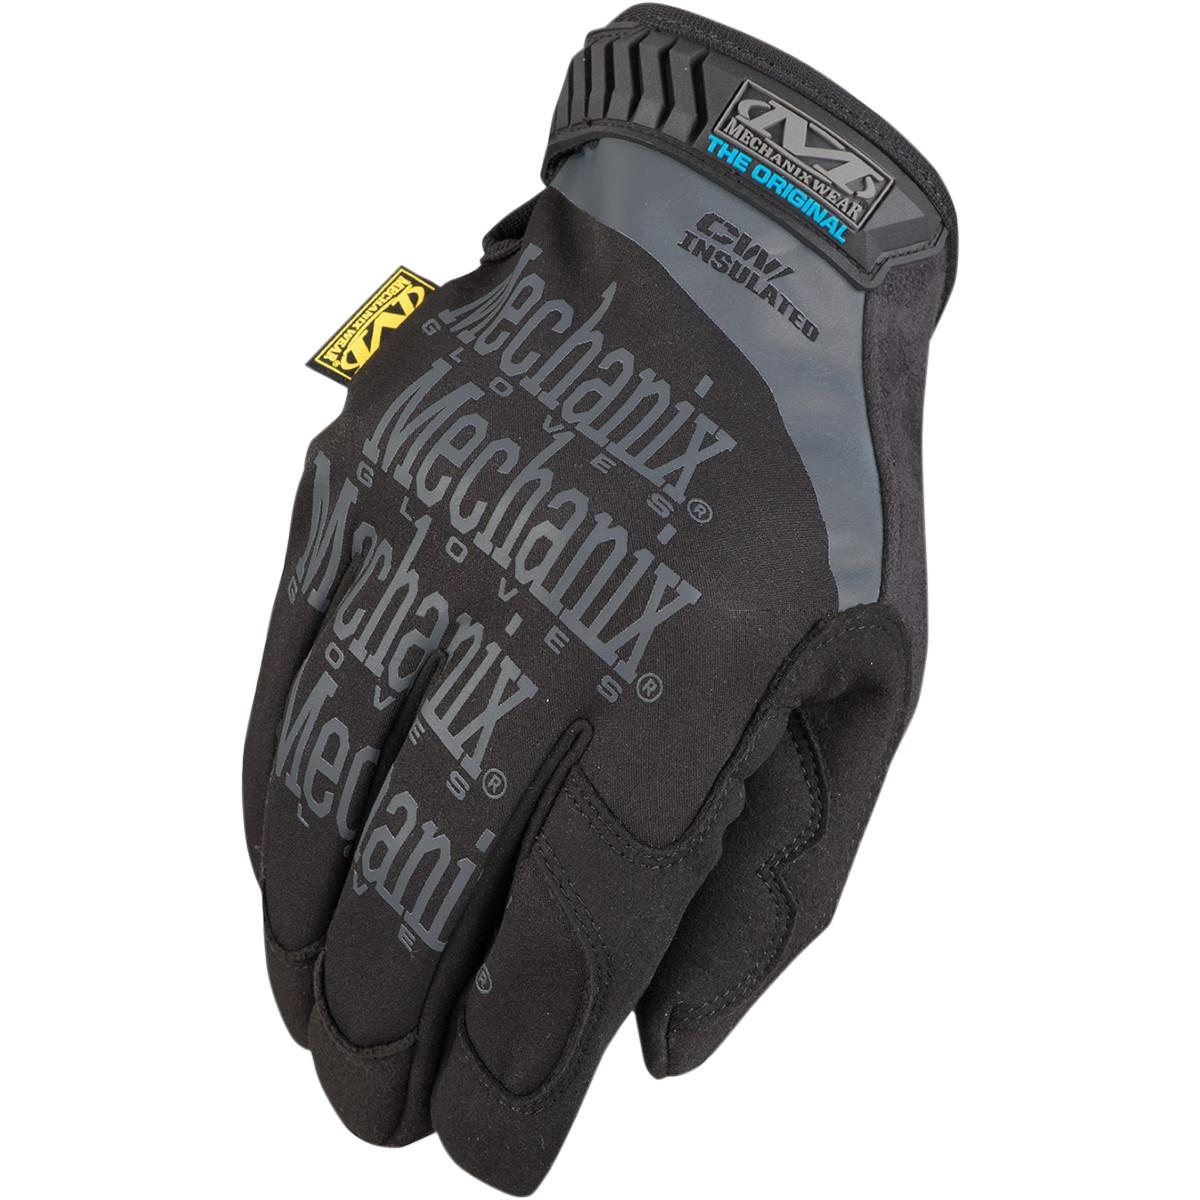 Mechanix Wear The Original Insulated Work Gloves (Black, Large 10)